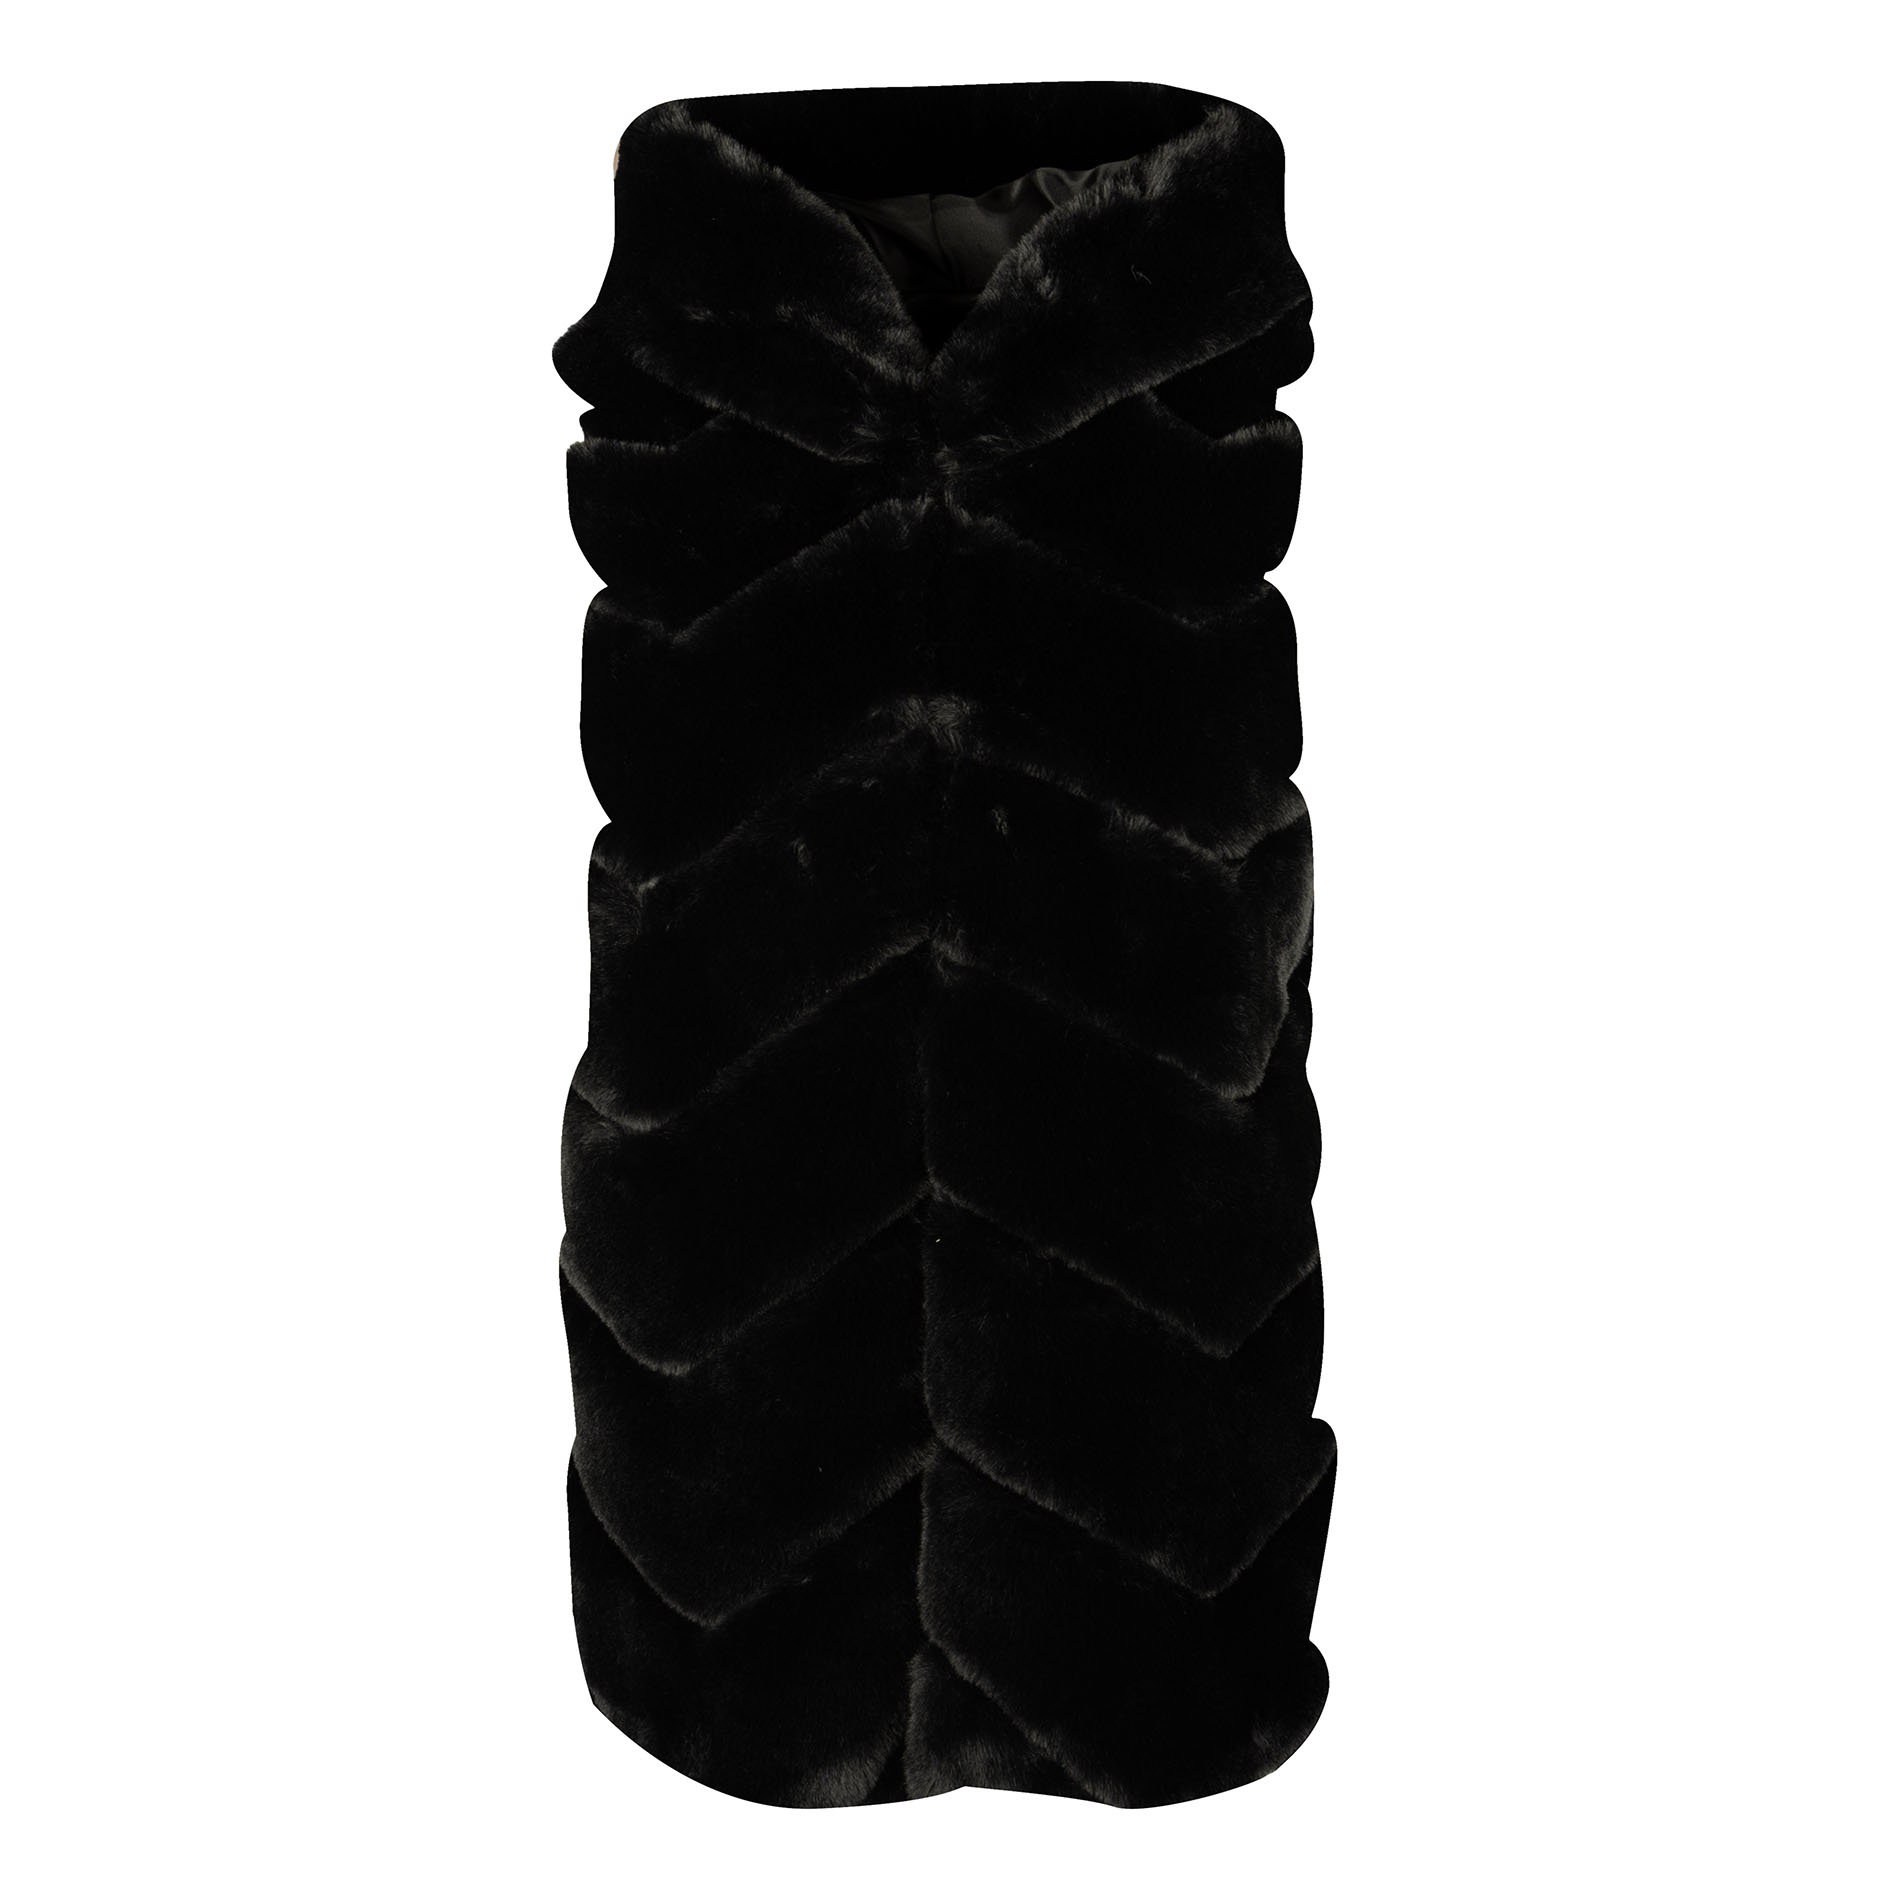 Pels 'Urmond' Black